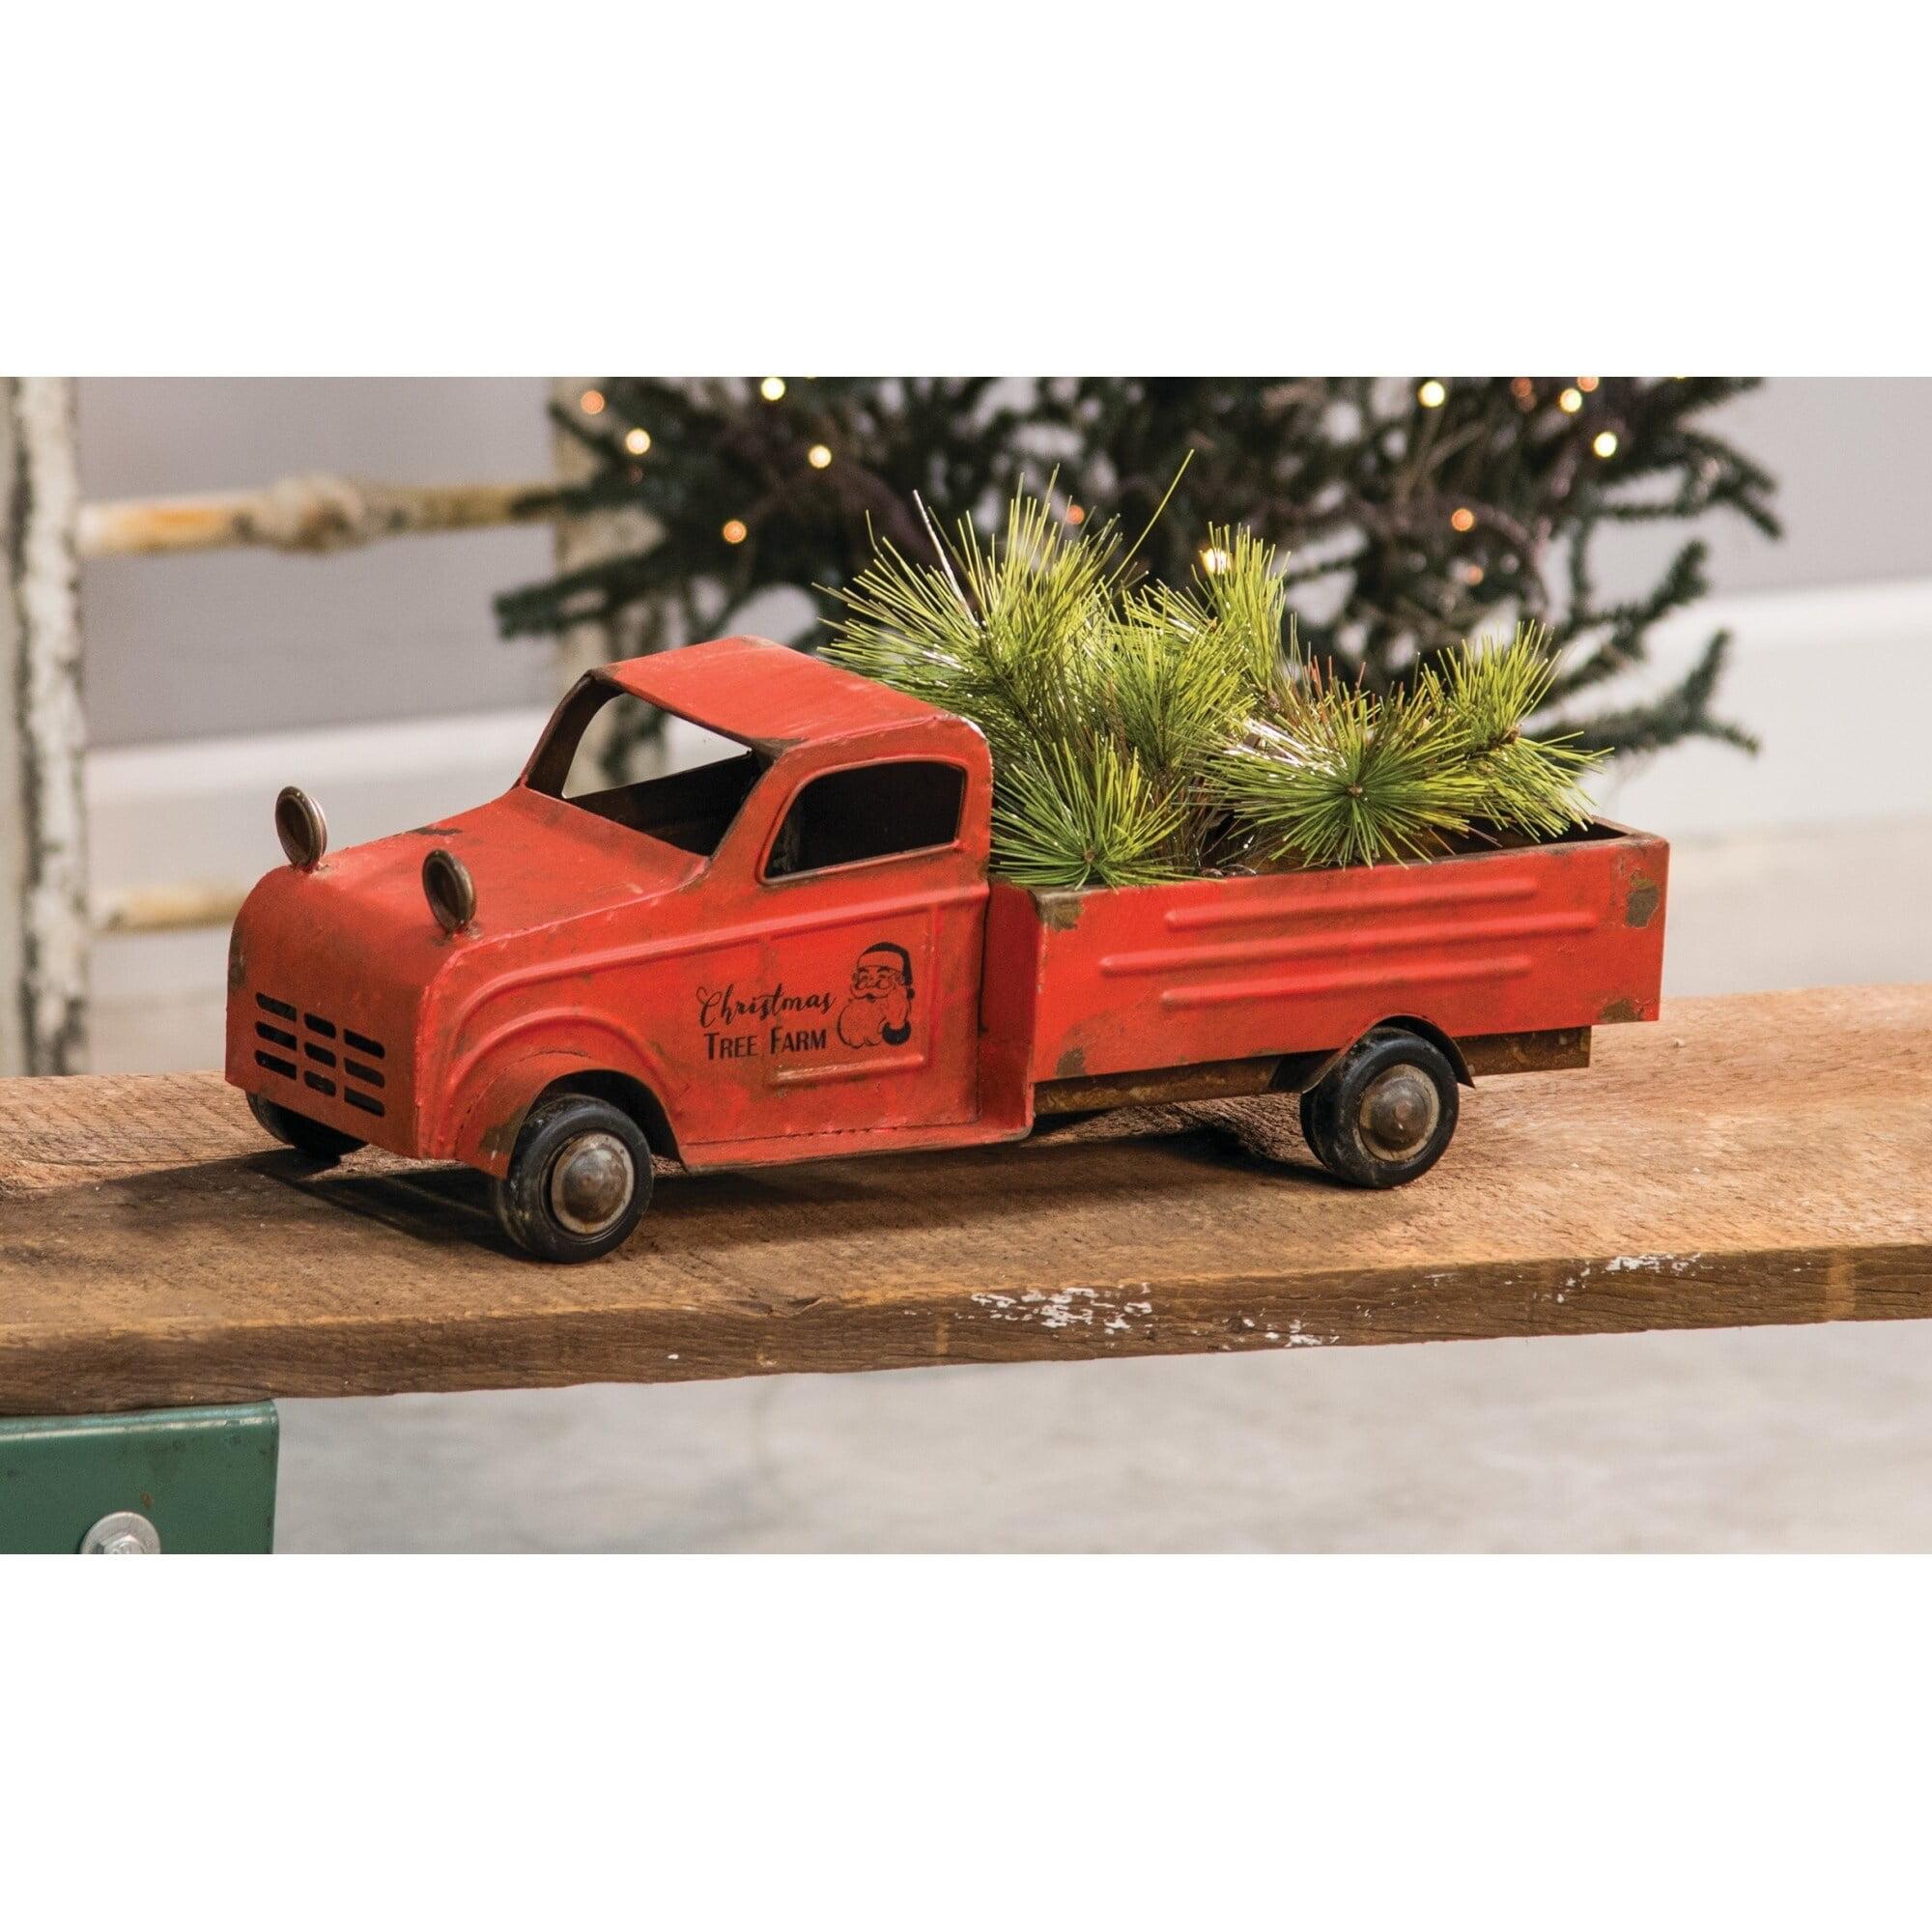 Big Fortune Vintage Red Truck Christmas Decoration Walmart Com Walmart Com